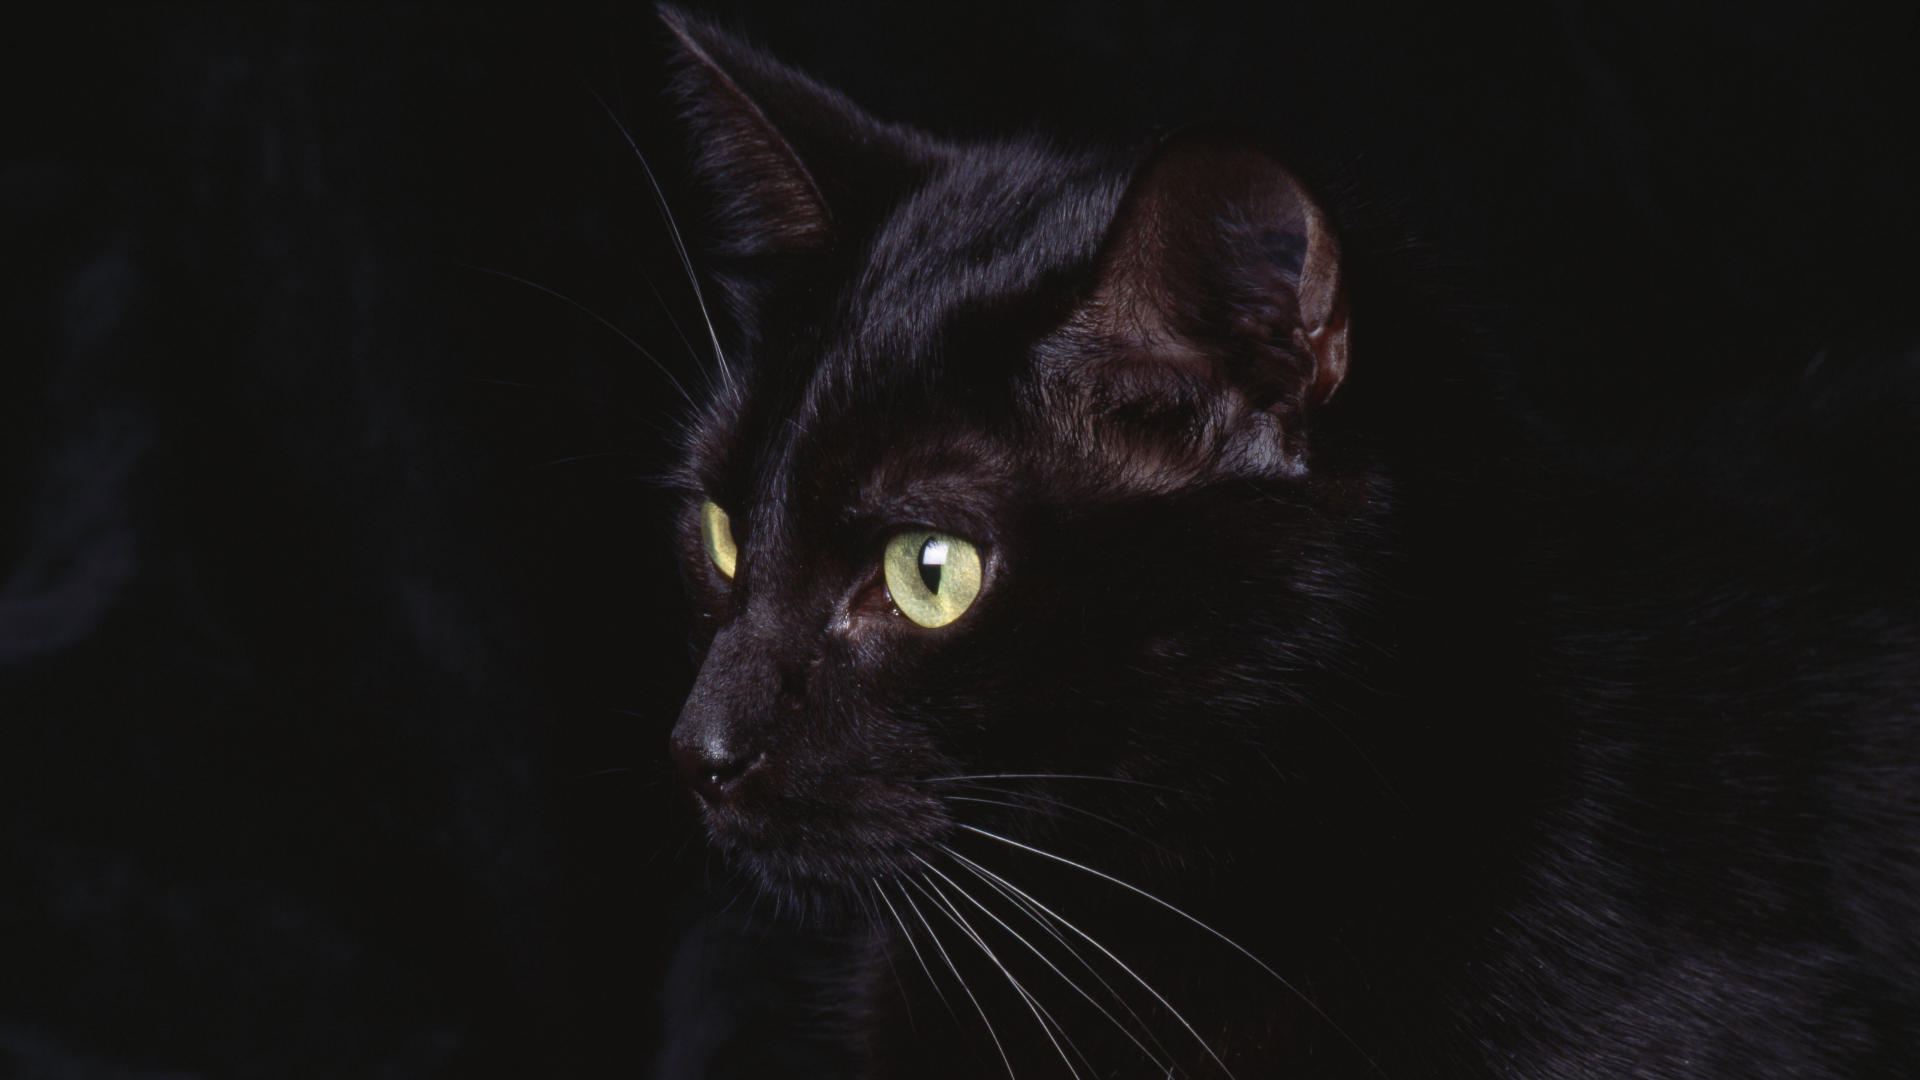 cat black animal wallpaper | 1920x1080 | #12026